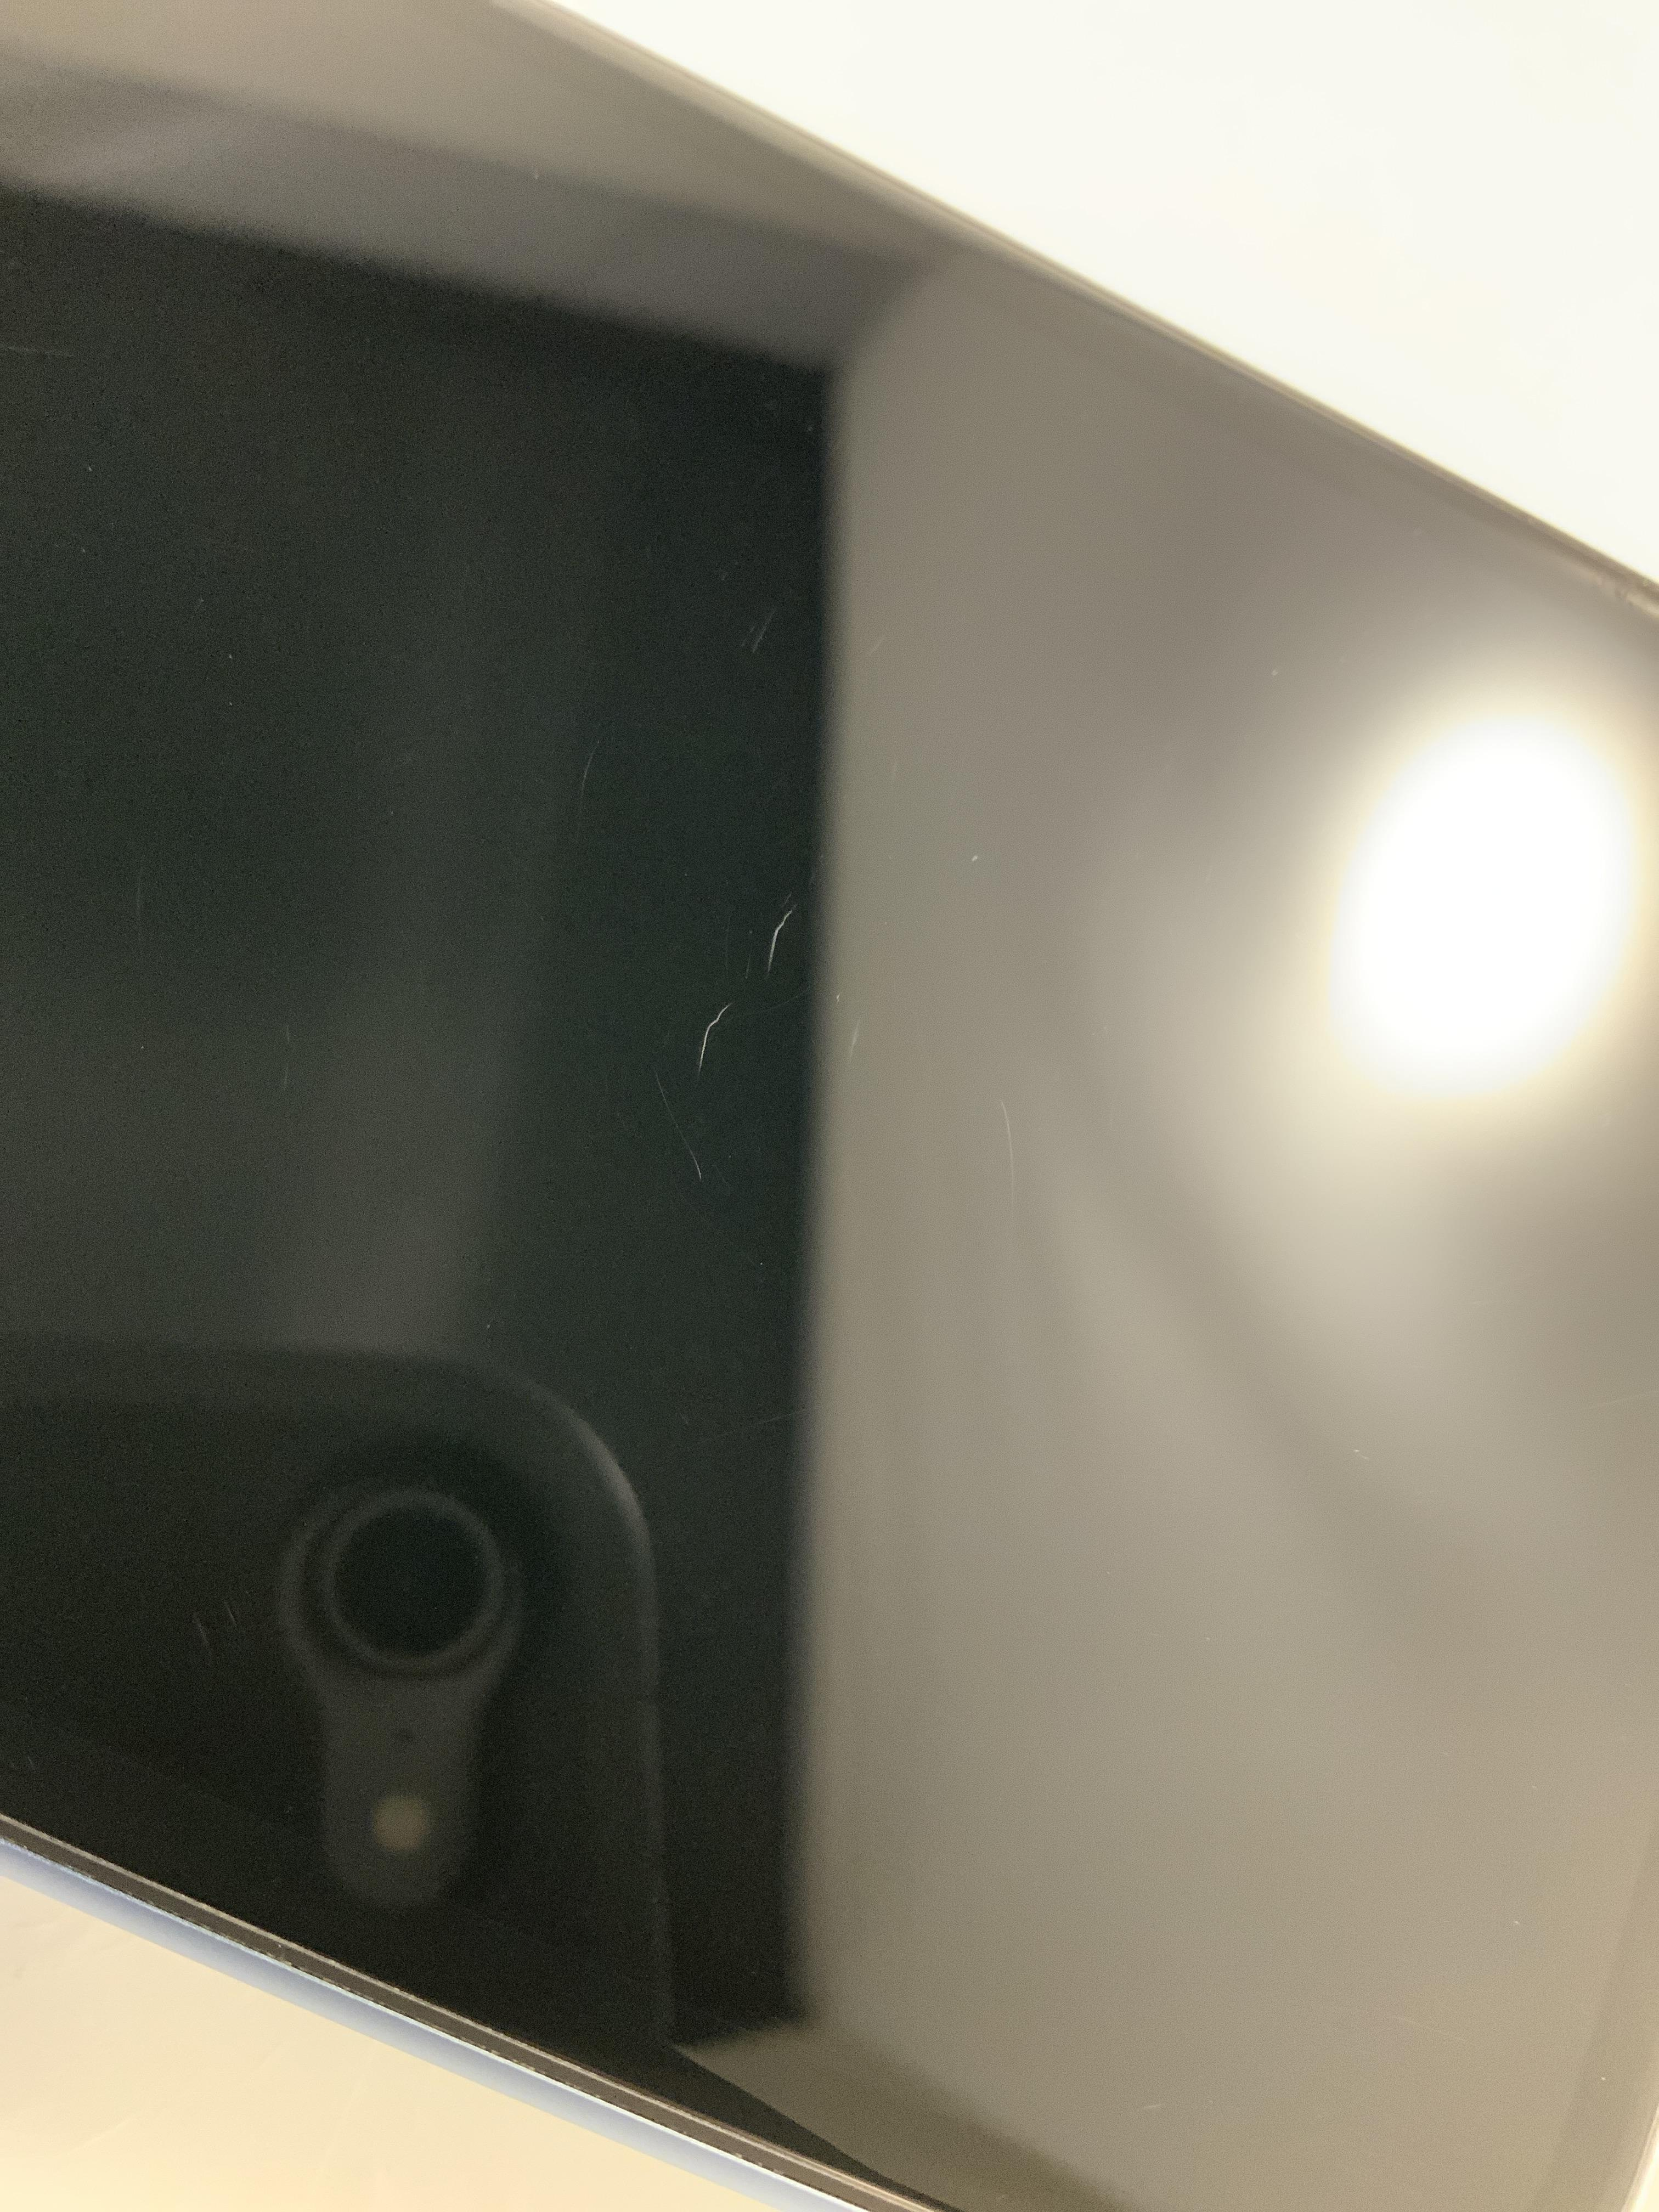 iPhone XR 128GB, 128GB, Blue, image 4